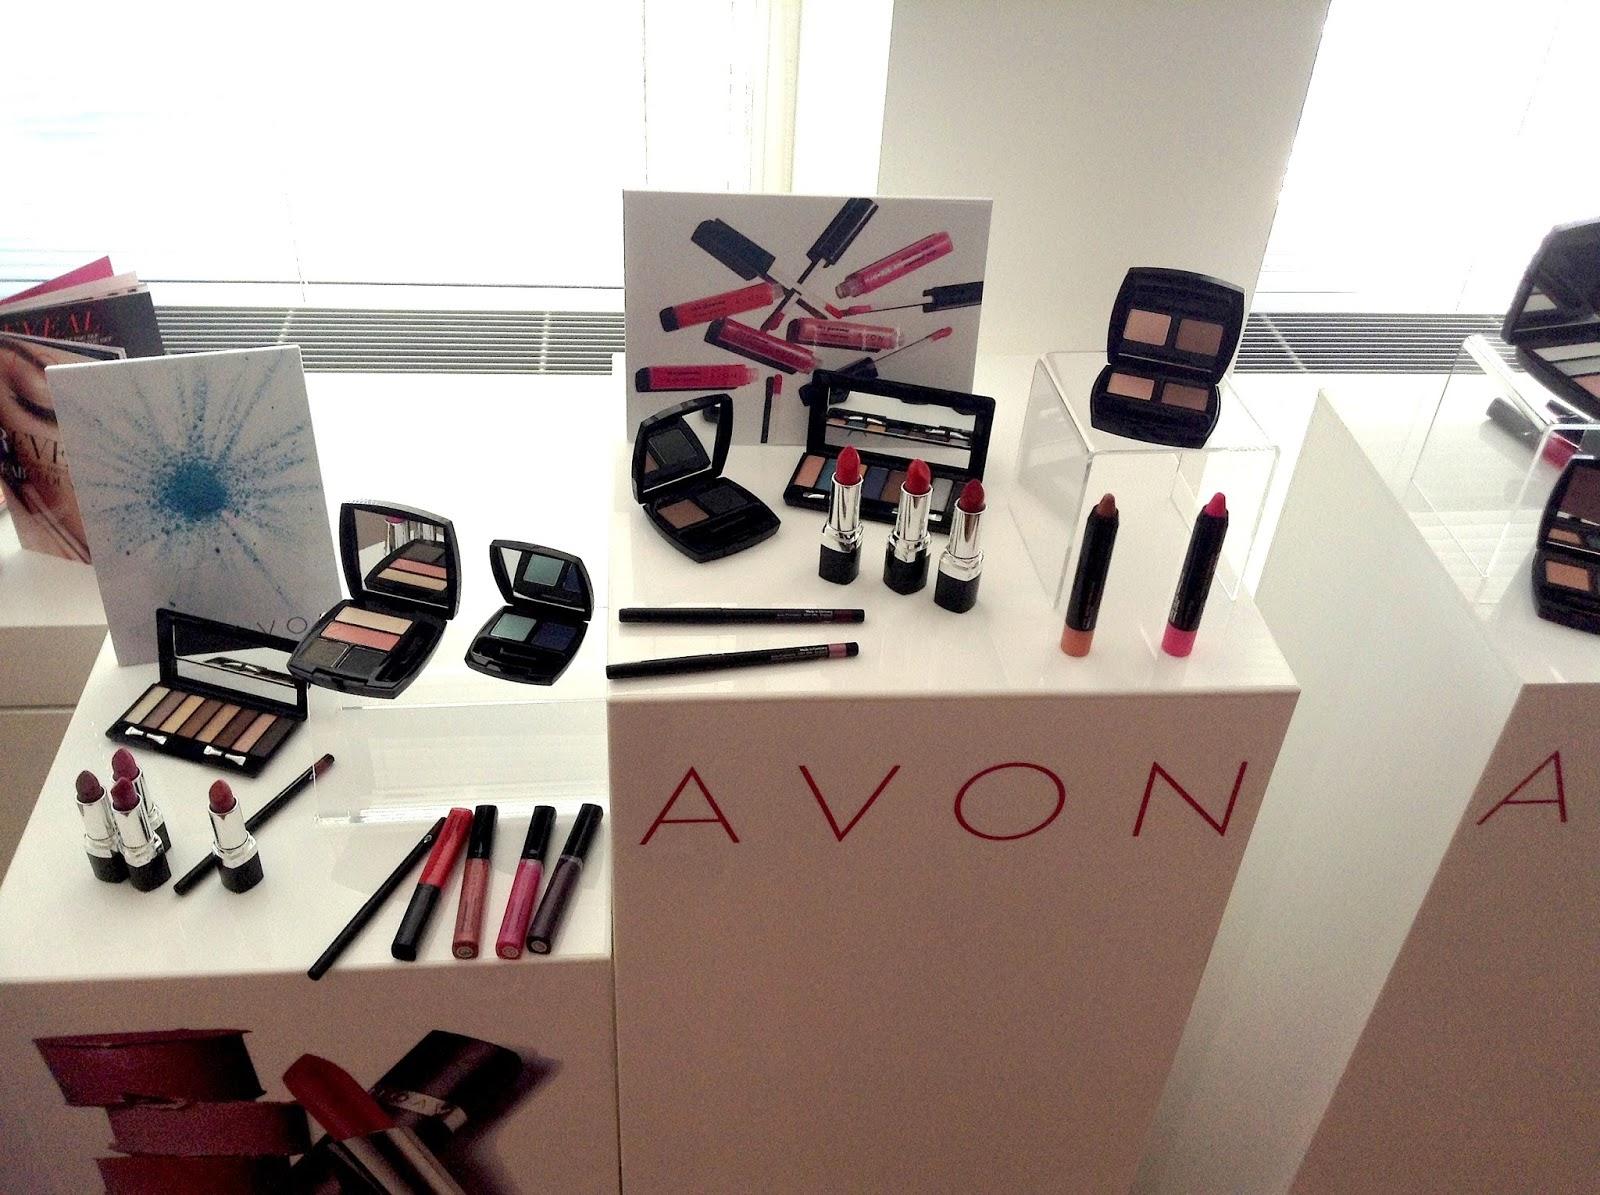 AVON's Make Up Launch